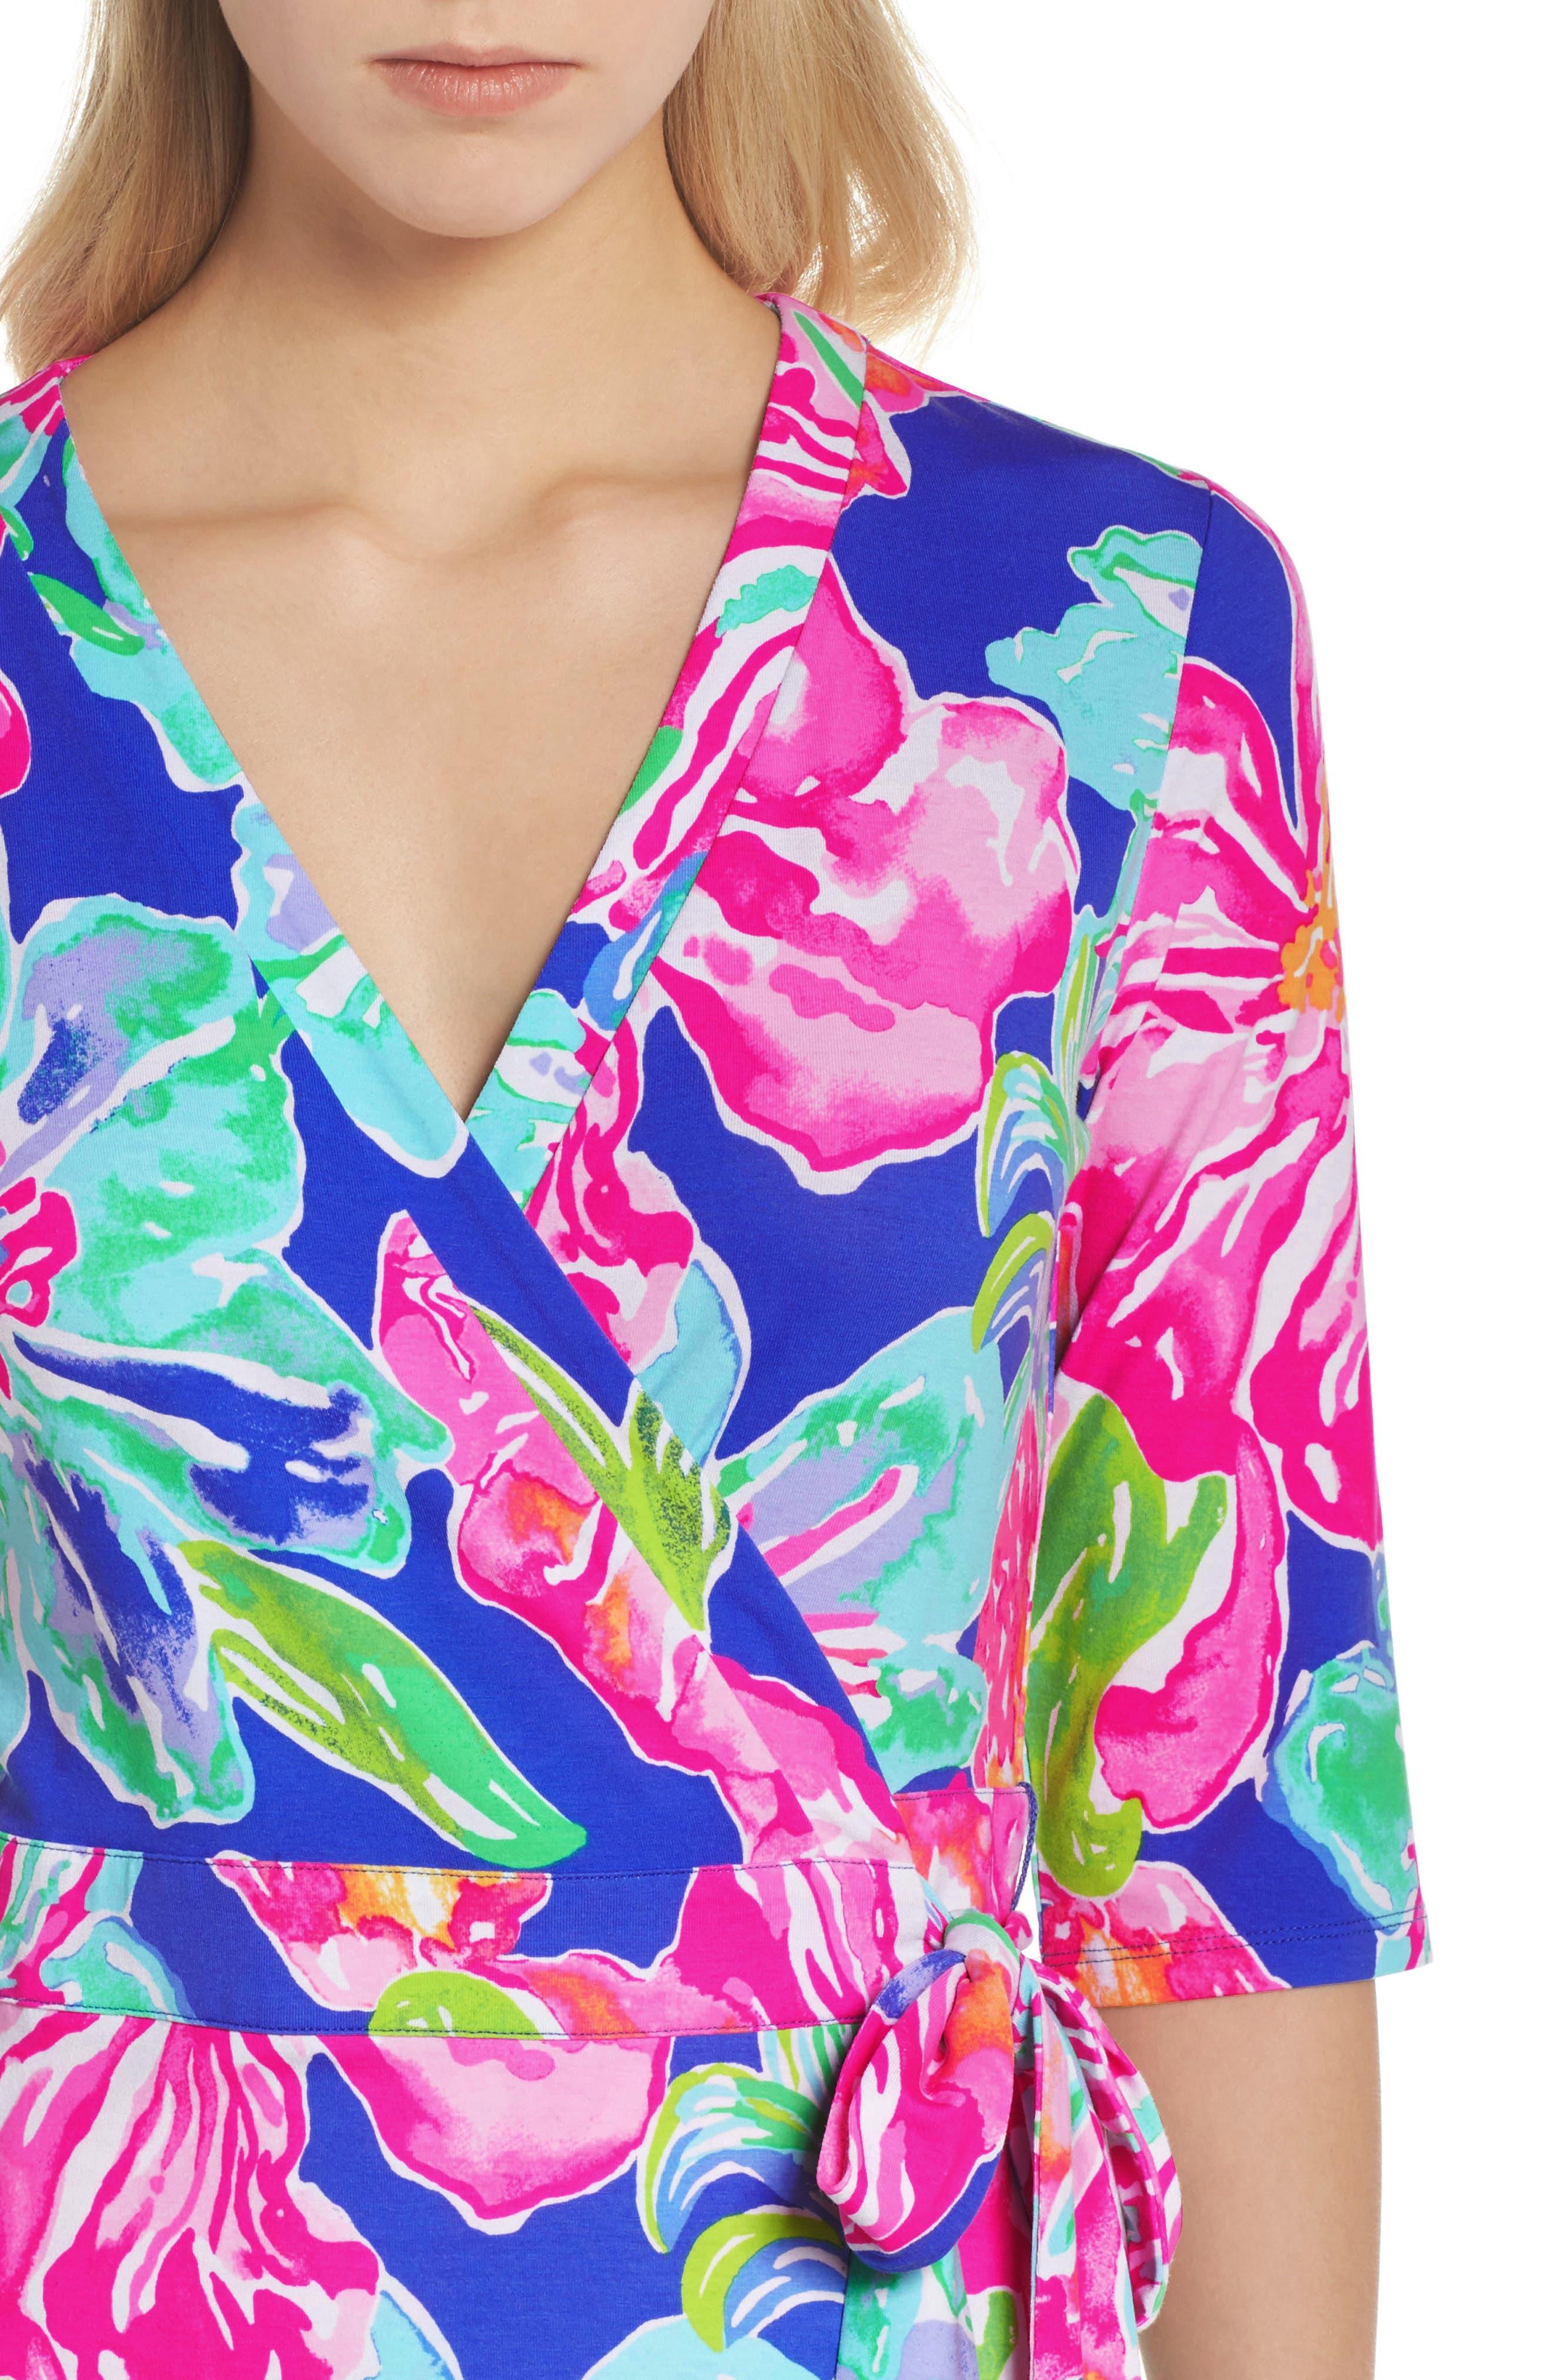 Marvista Wrap Dress,                             Alternate thumbnail 4, color,                             Beckon Blue Jungle Utopia